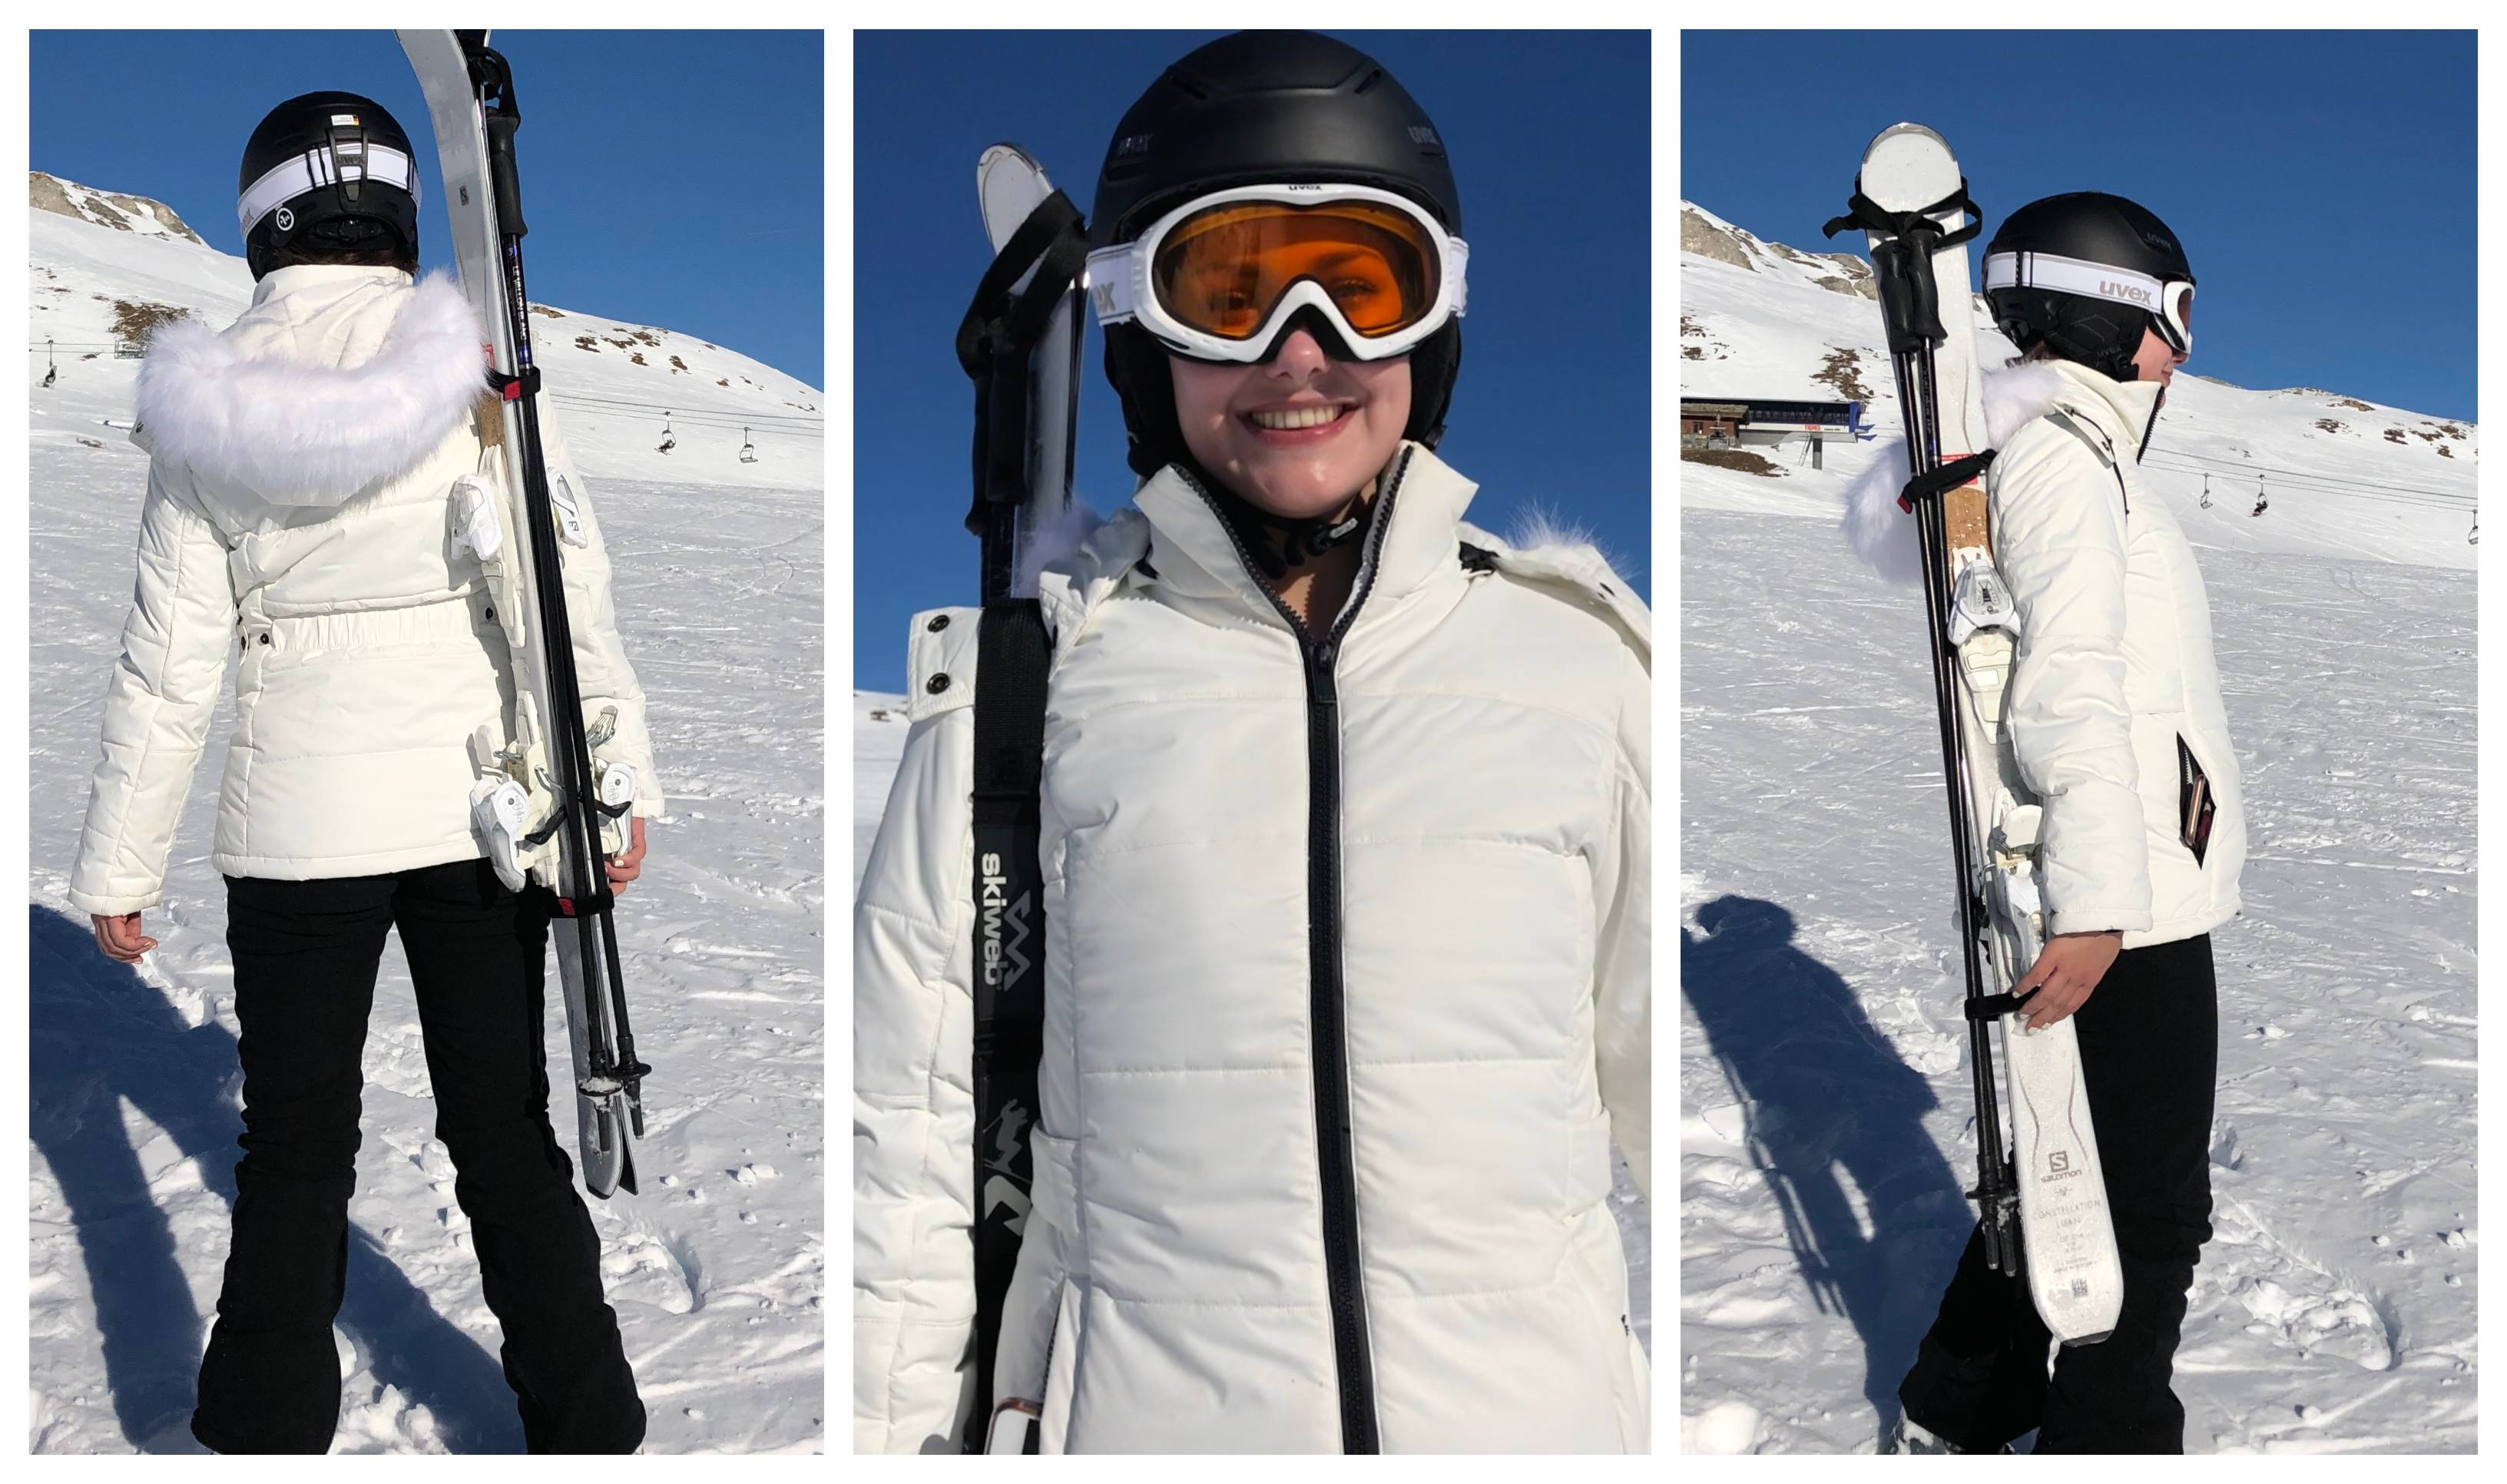 BeFunky-collage Skiweb Ski Carrier 2019